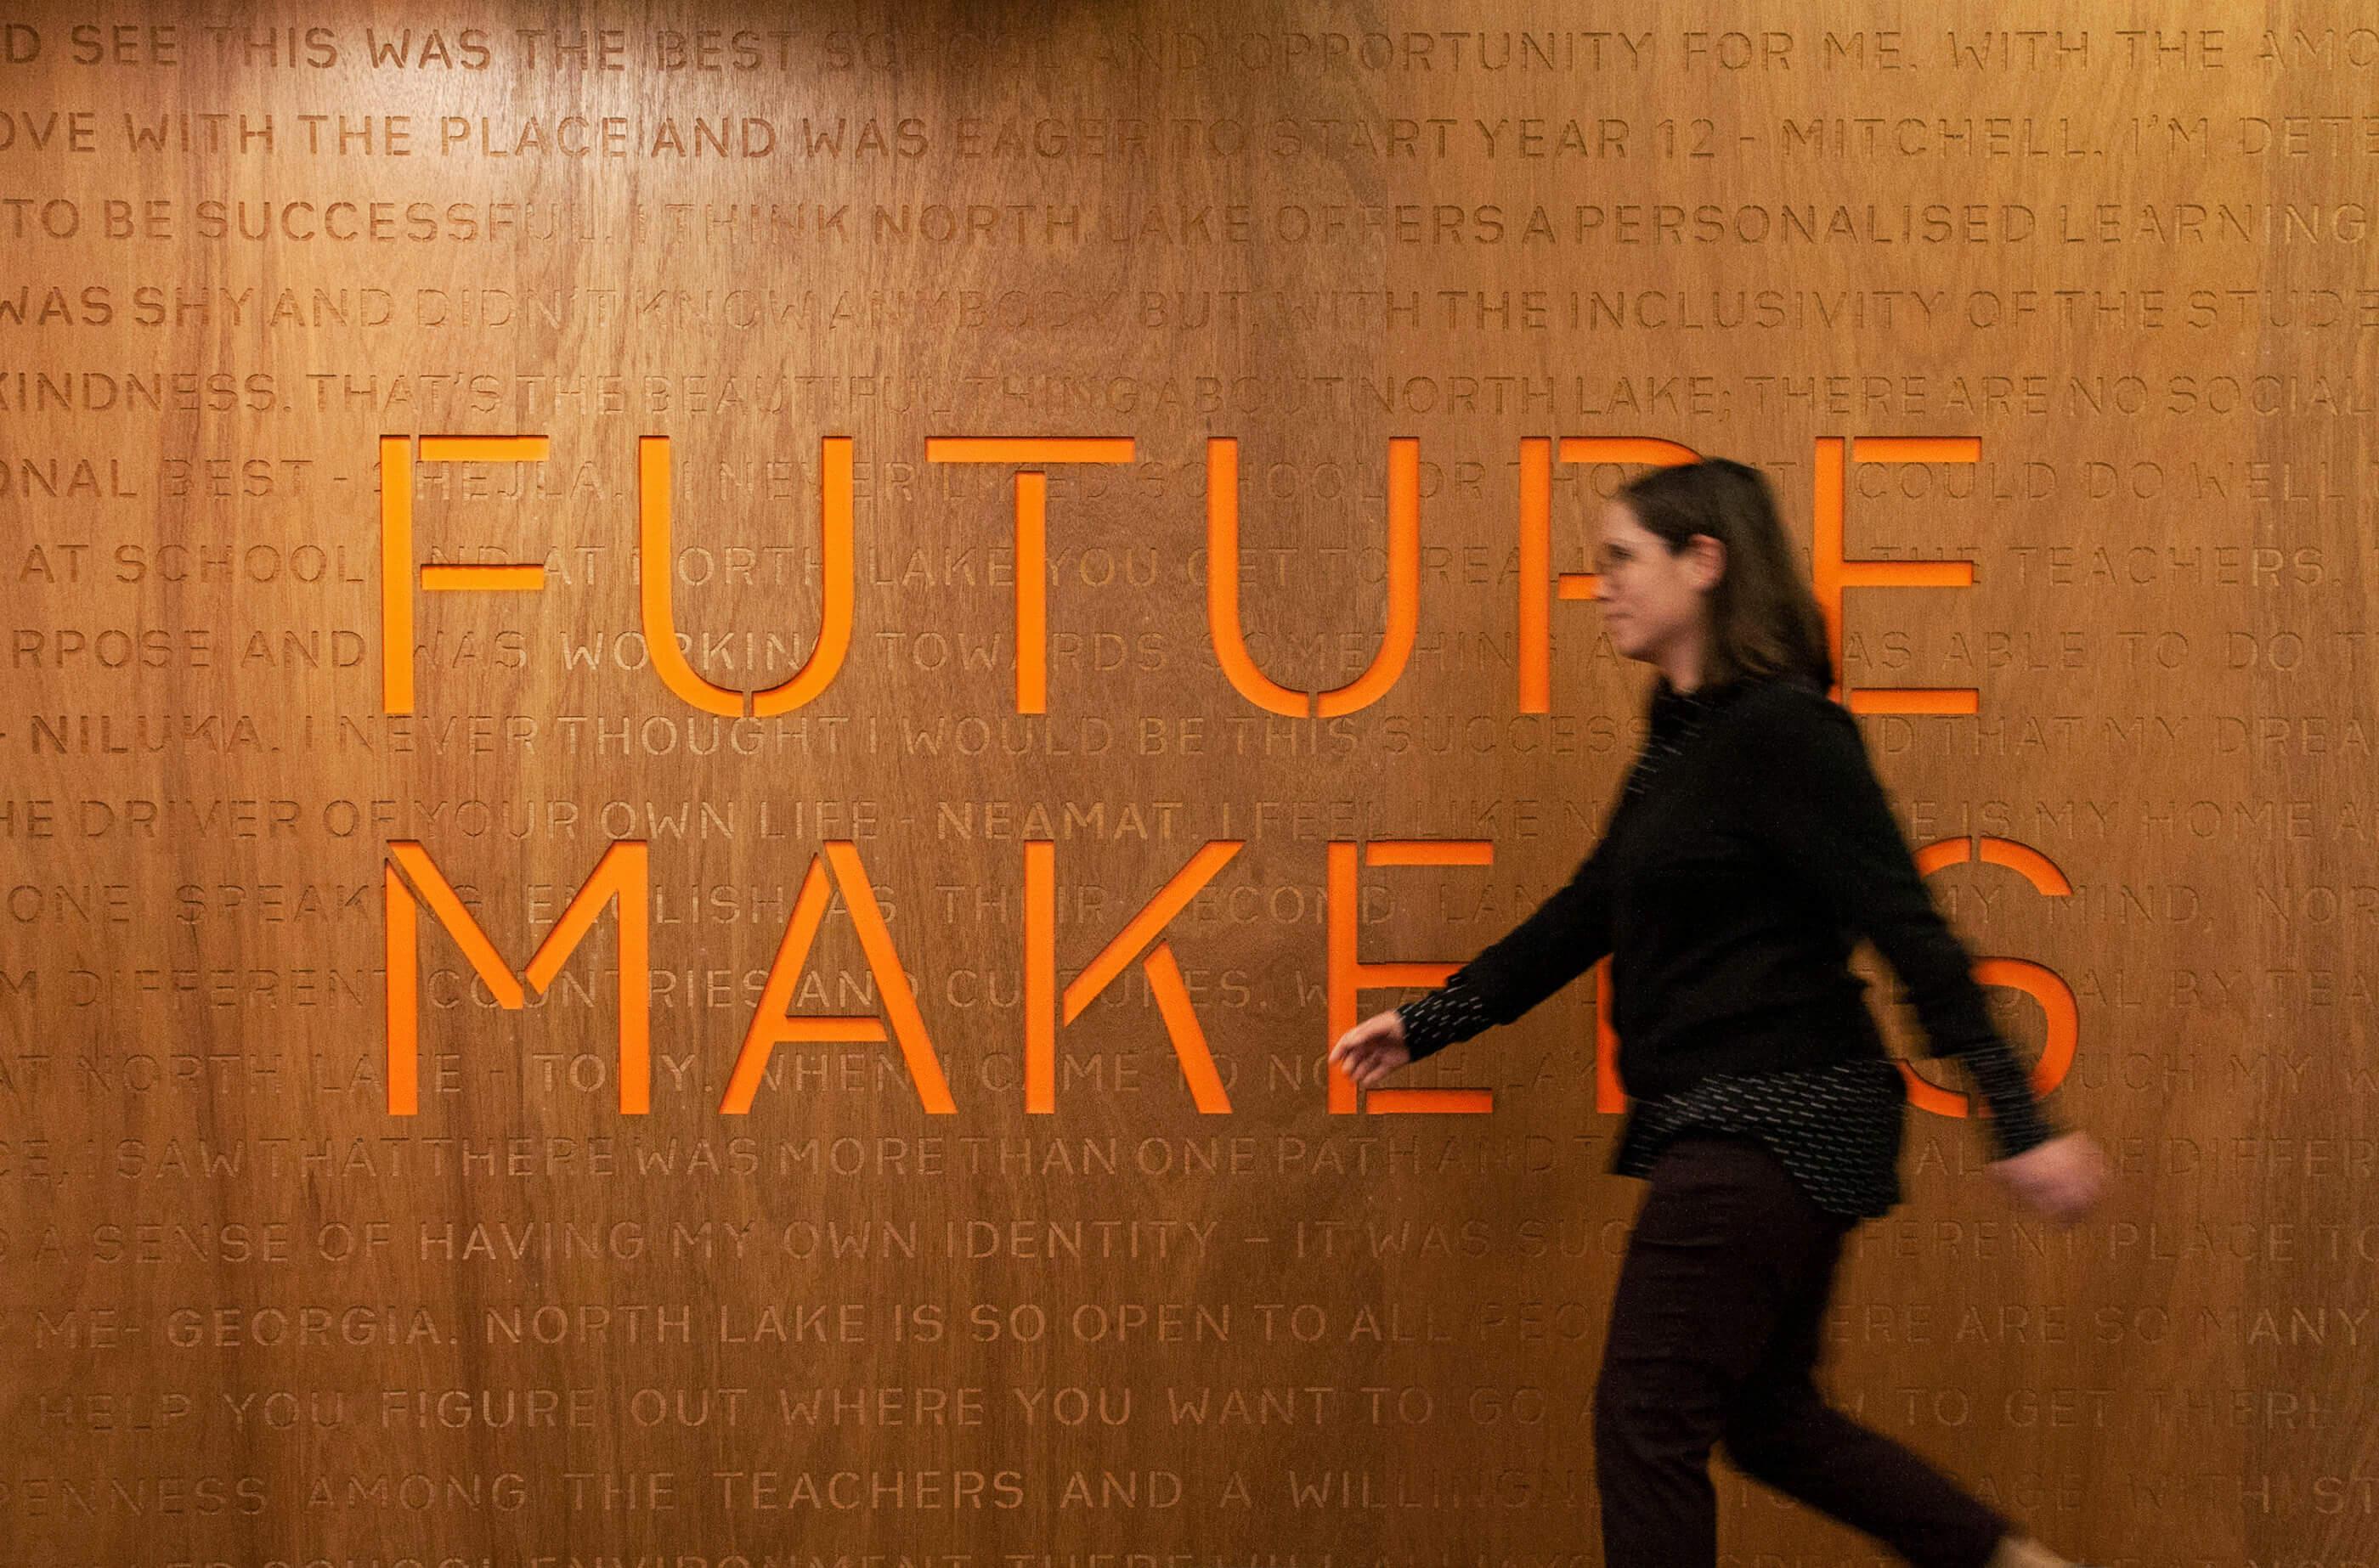 Future Maker Signage